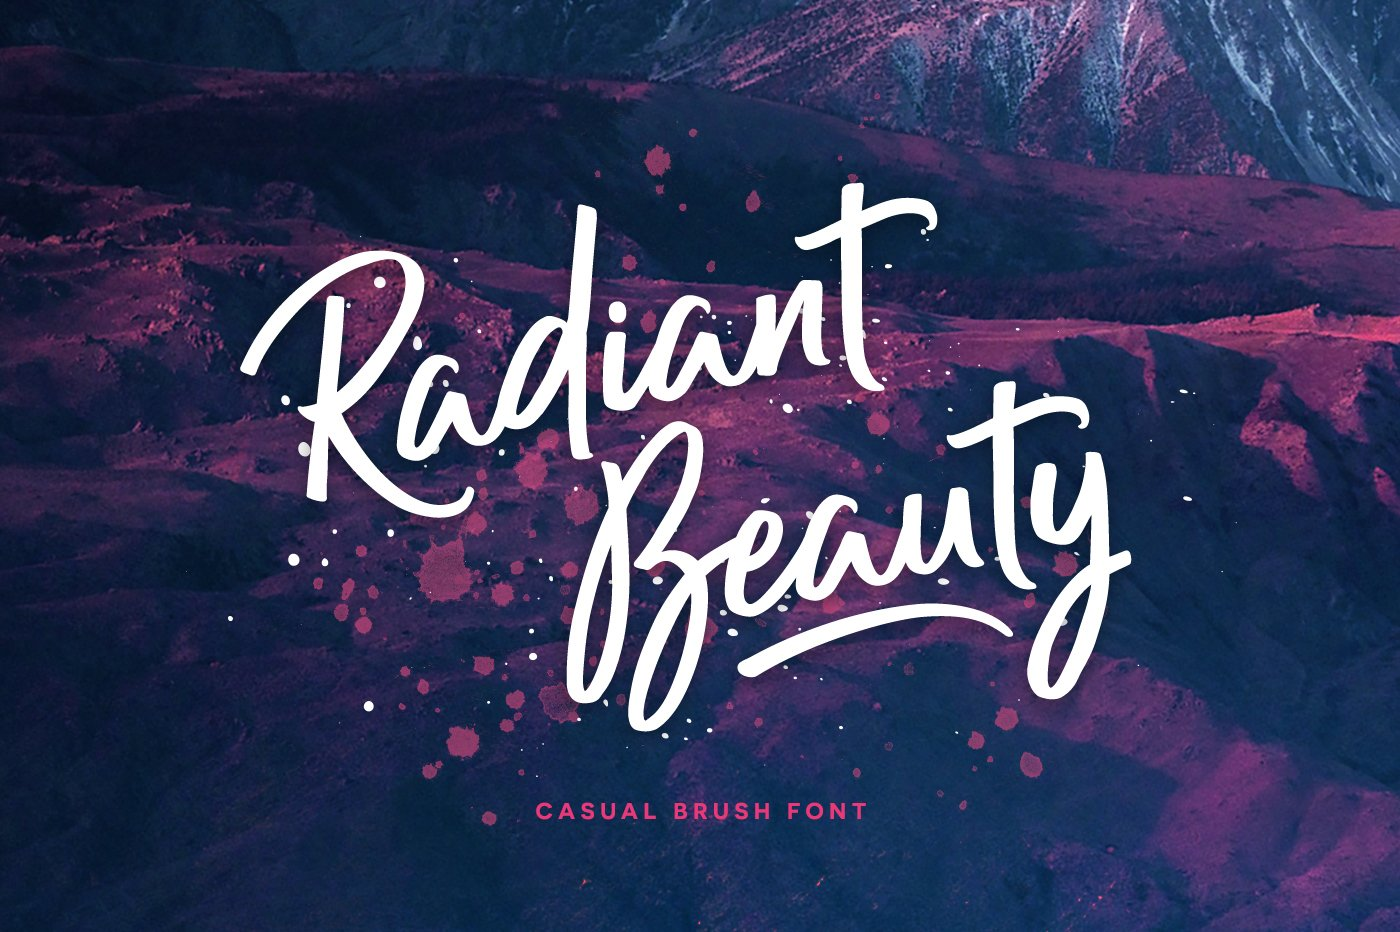 Radiant Beauty Casual Brush Font Script Fonts